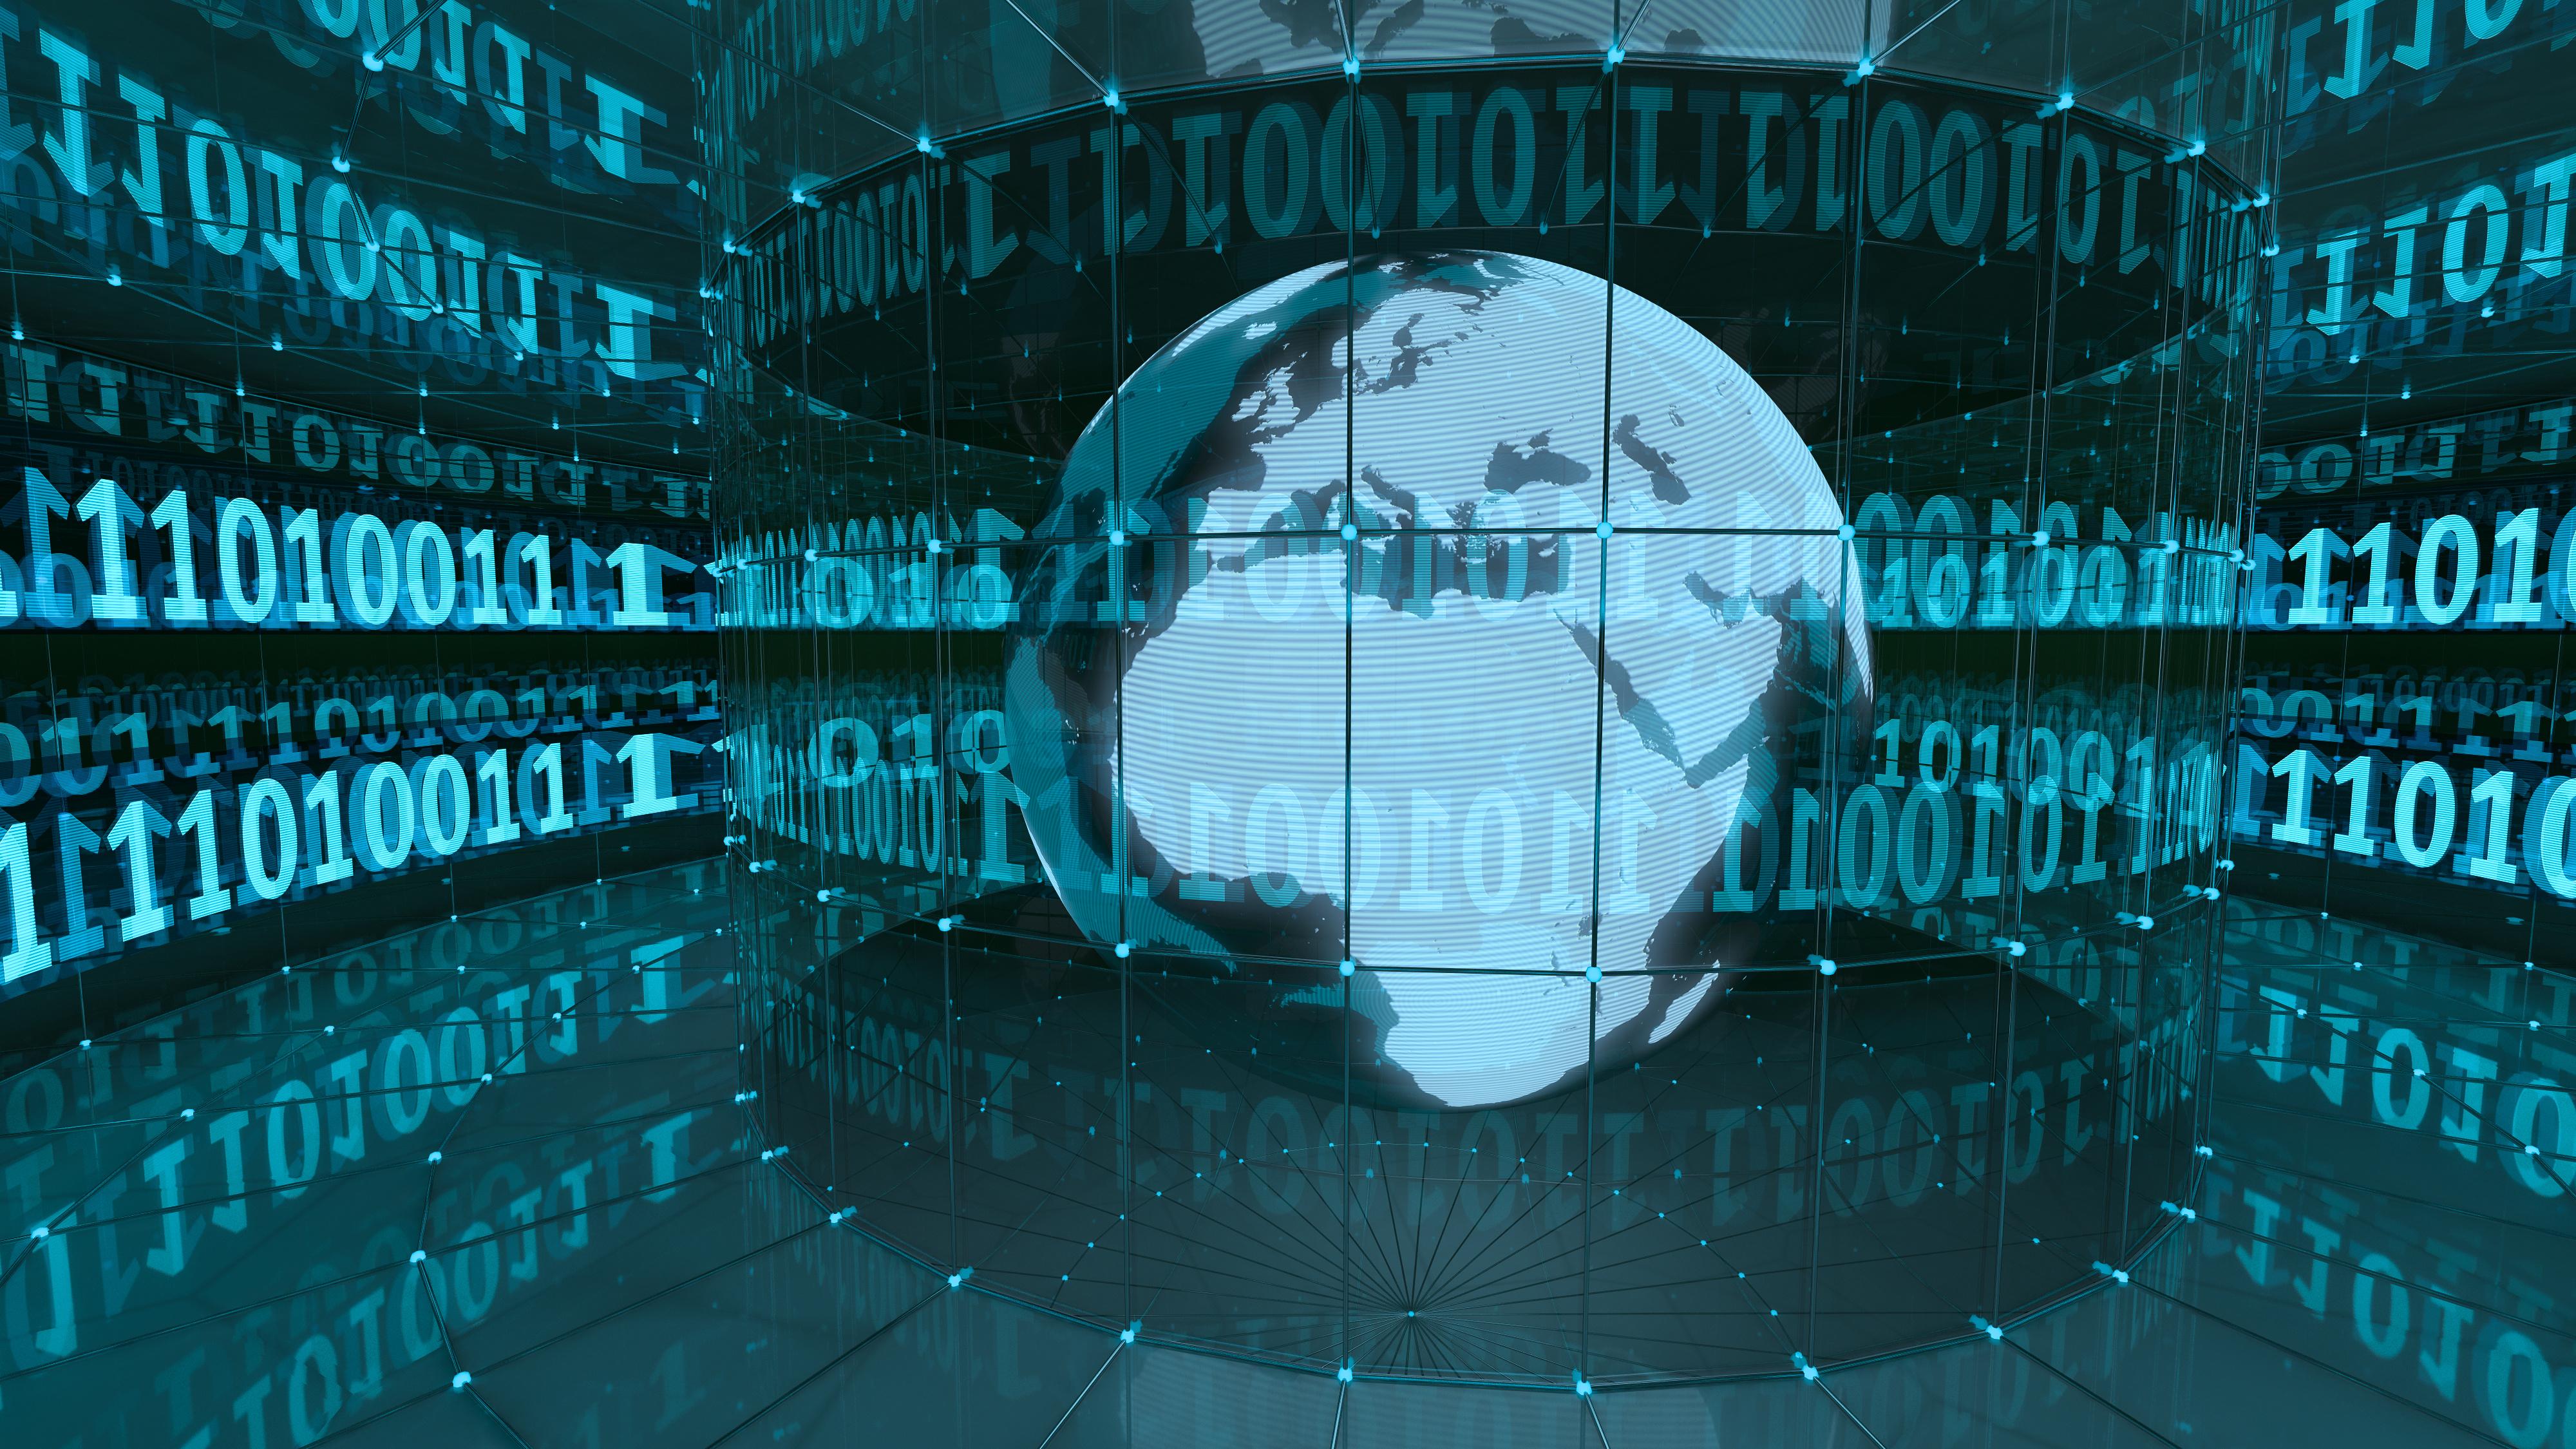 Digital World in Blue